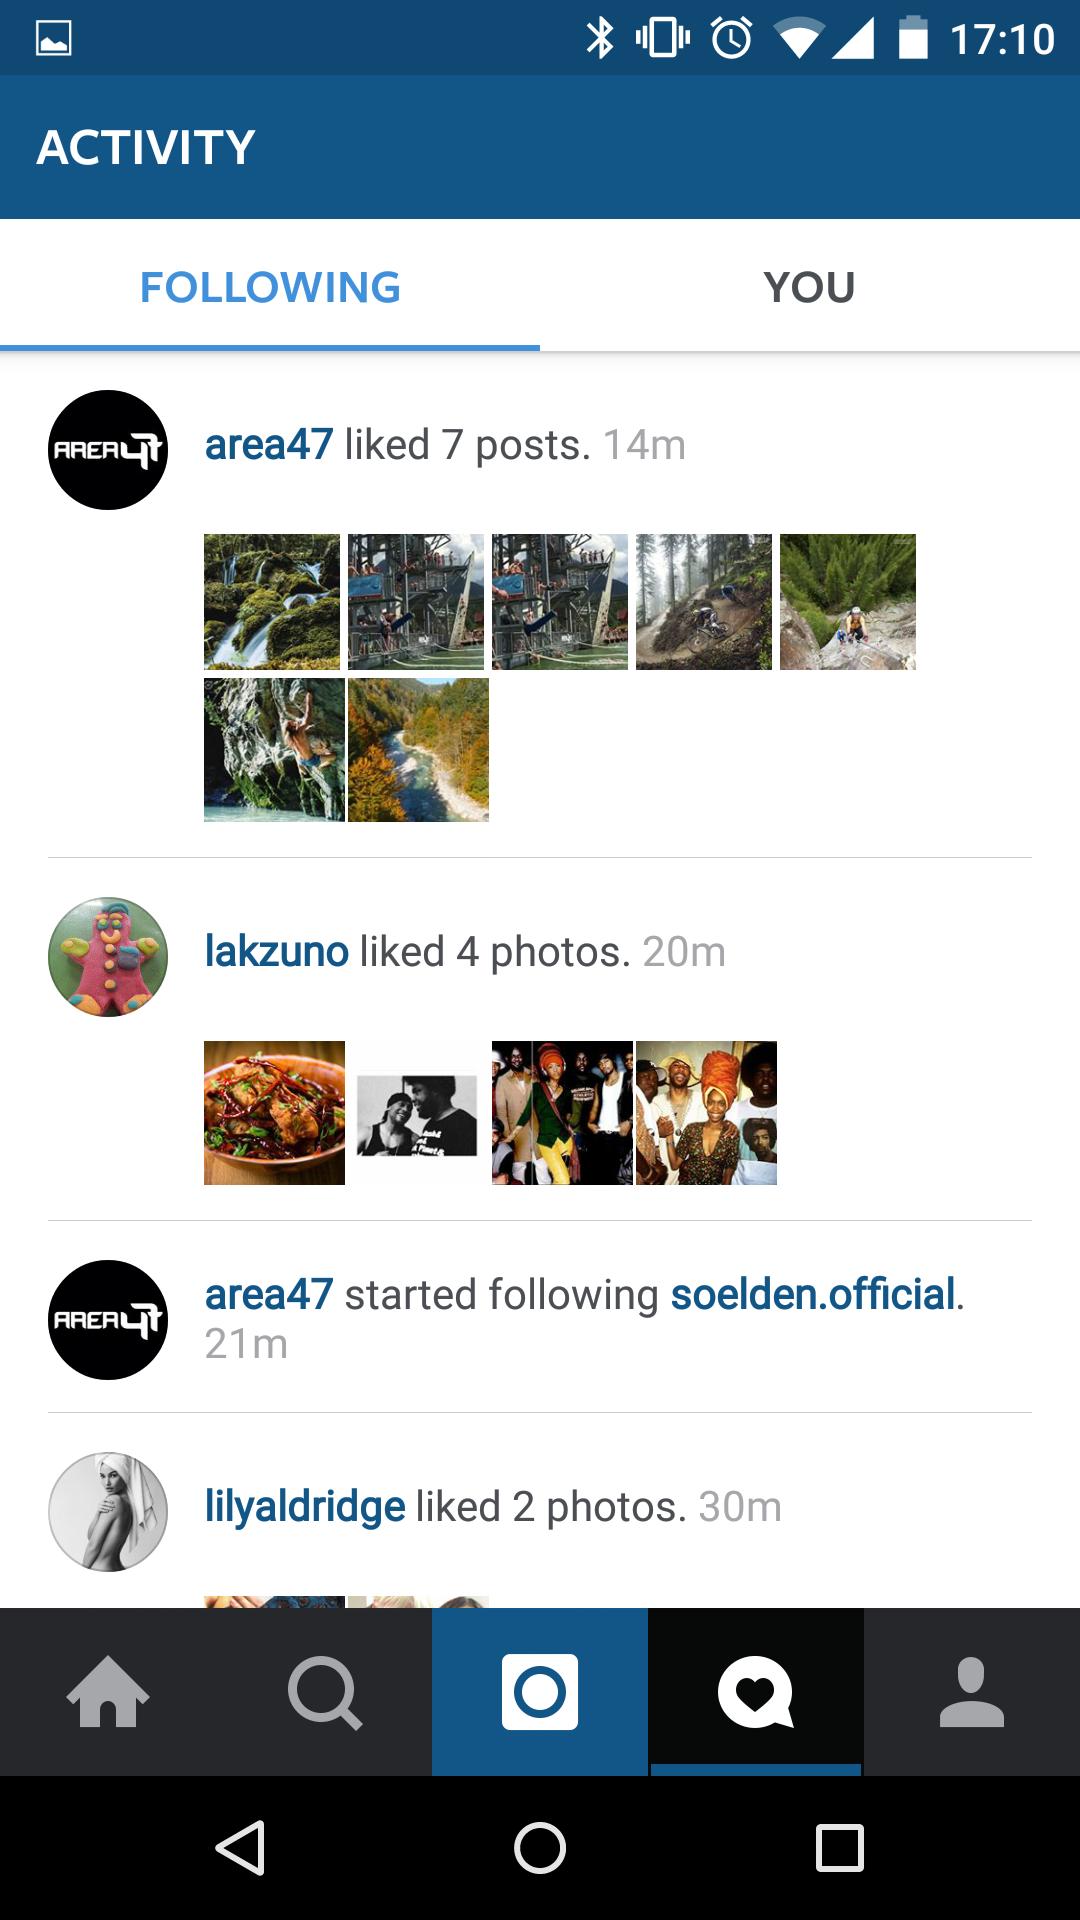 Instagram Activity Following